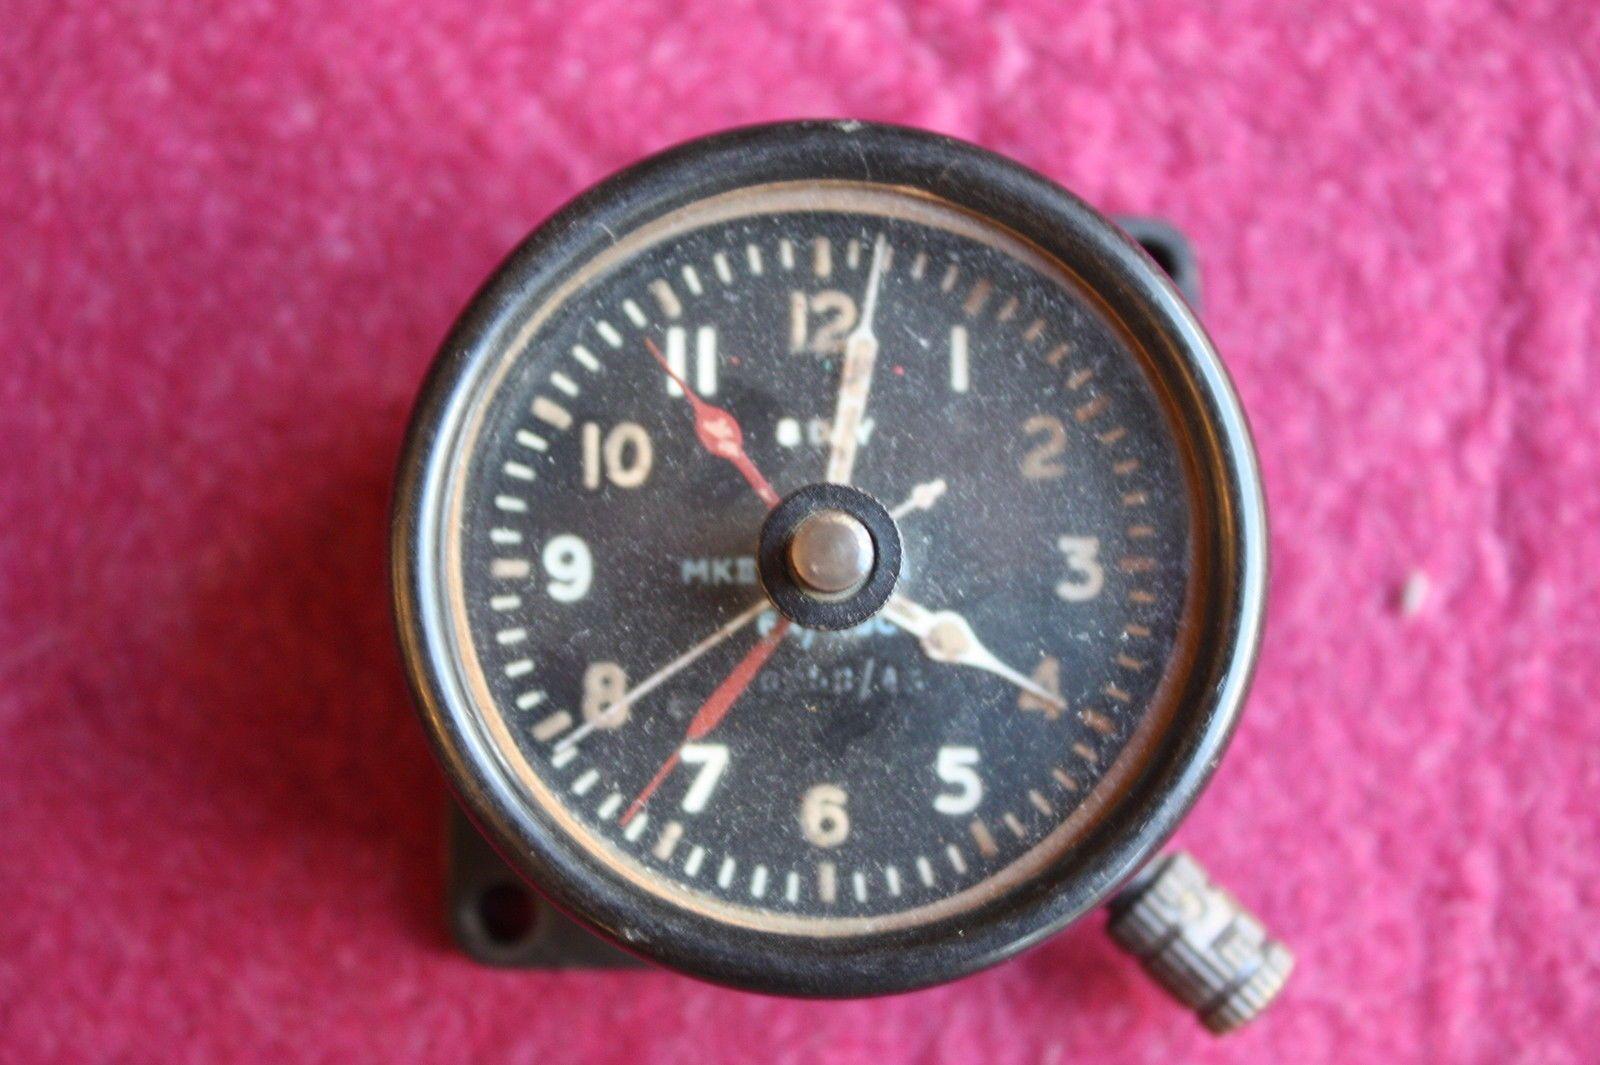 RAF JAEGER AIRCRAFT COCKPIT DASHBOARD CLOCK 1943 WWII